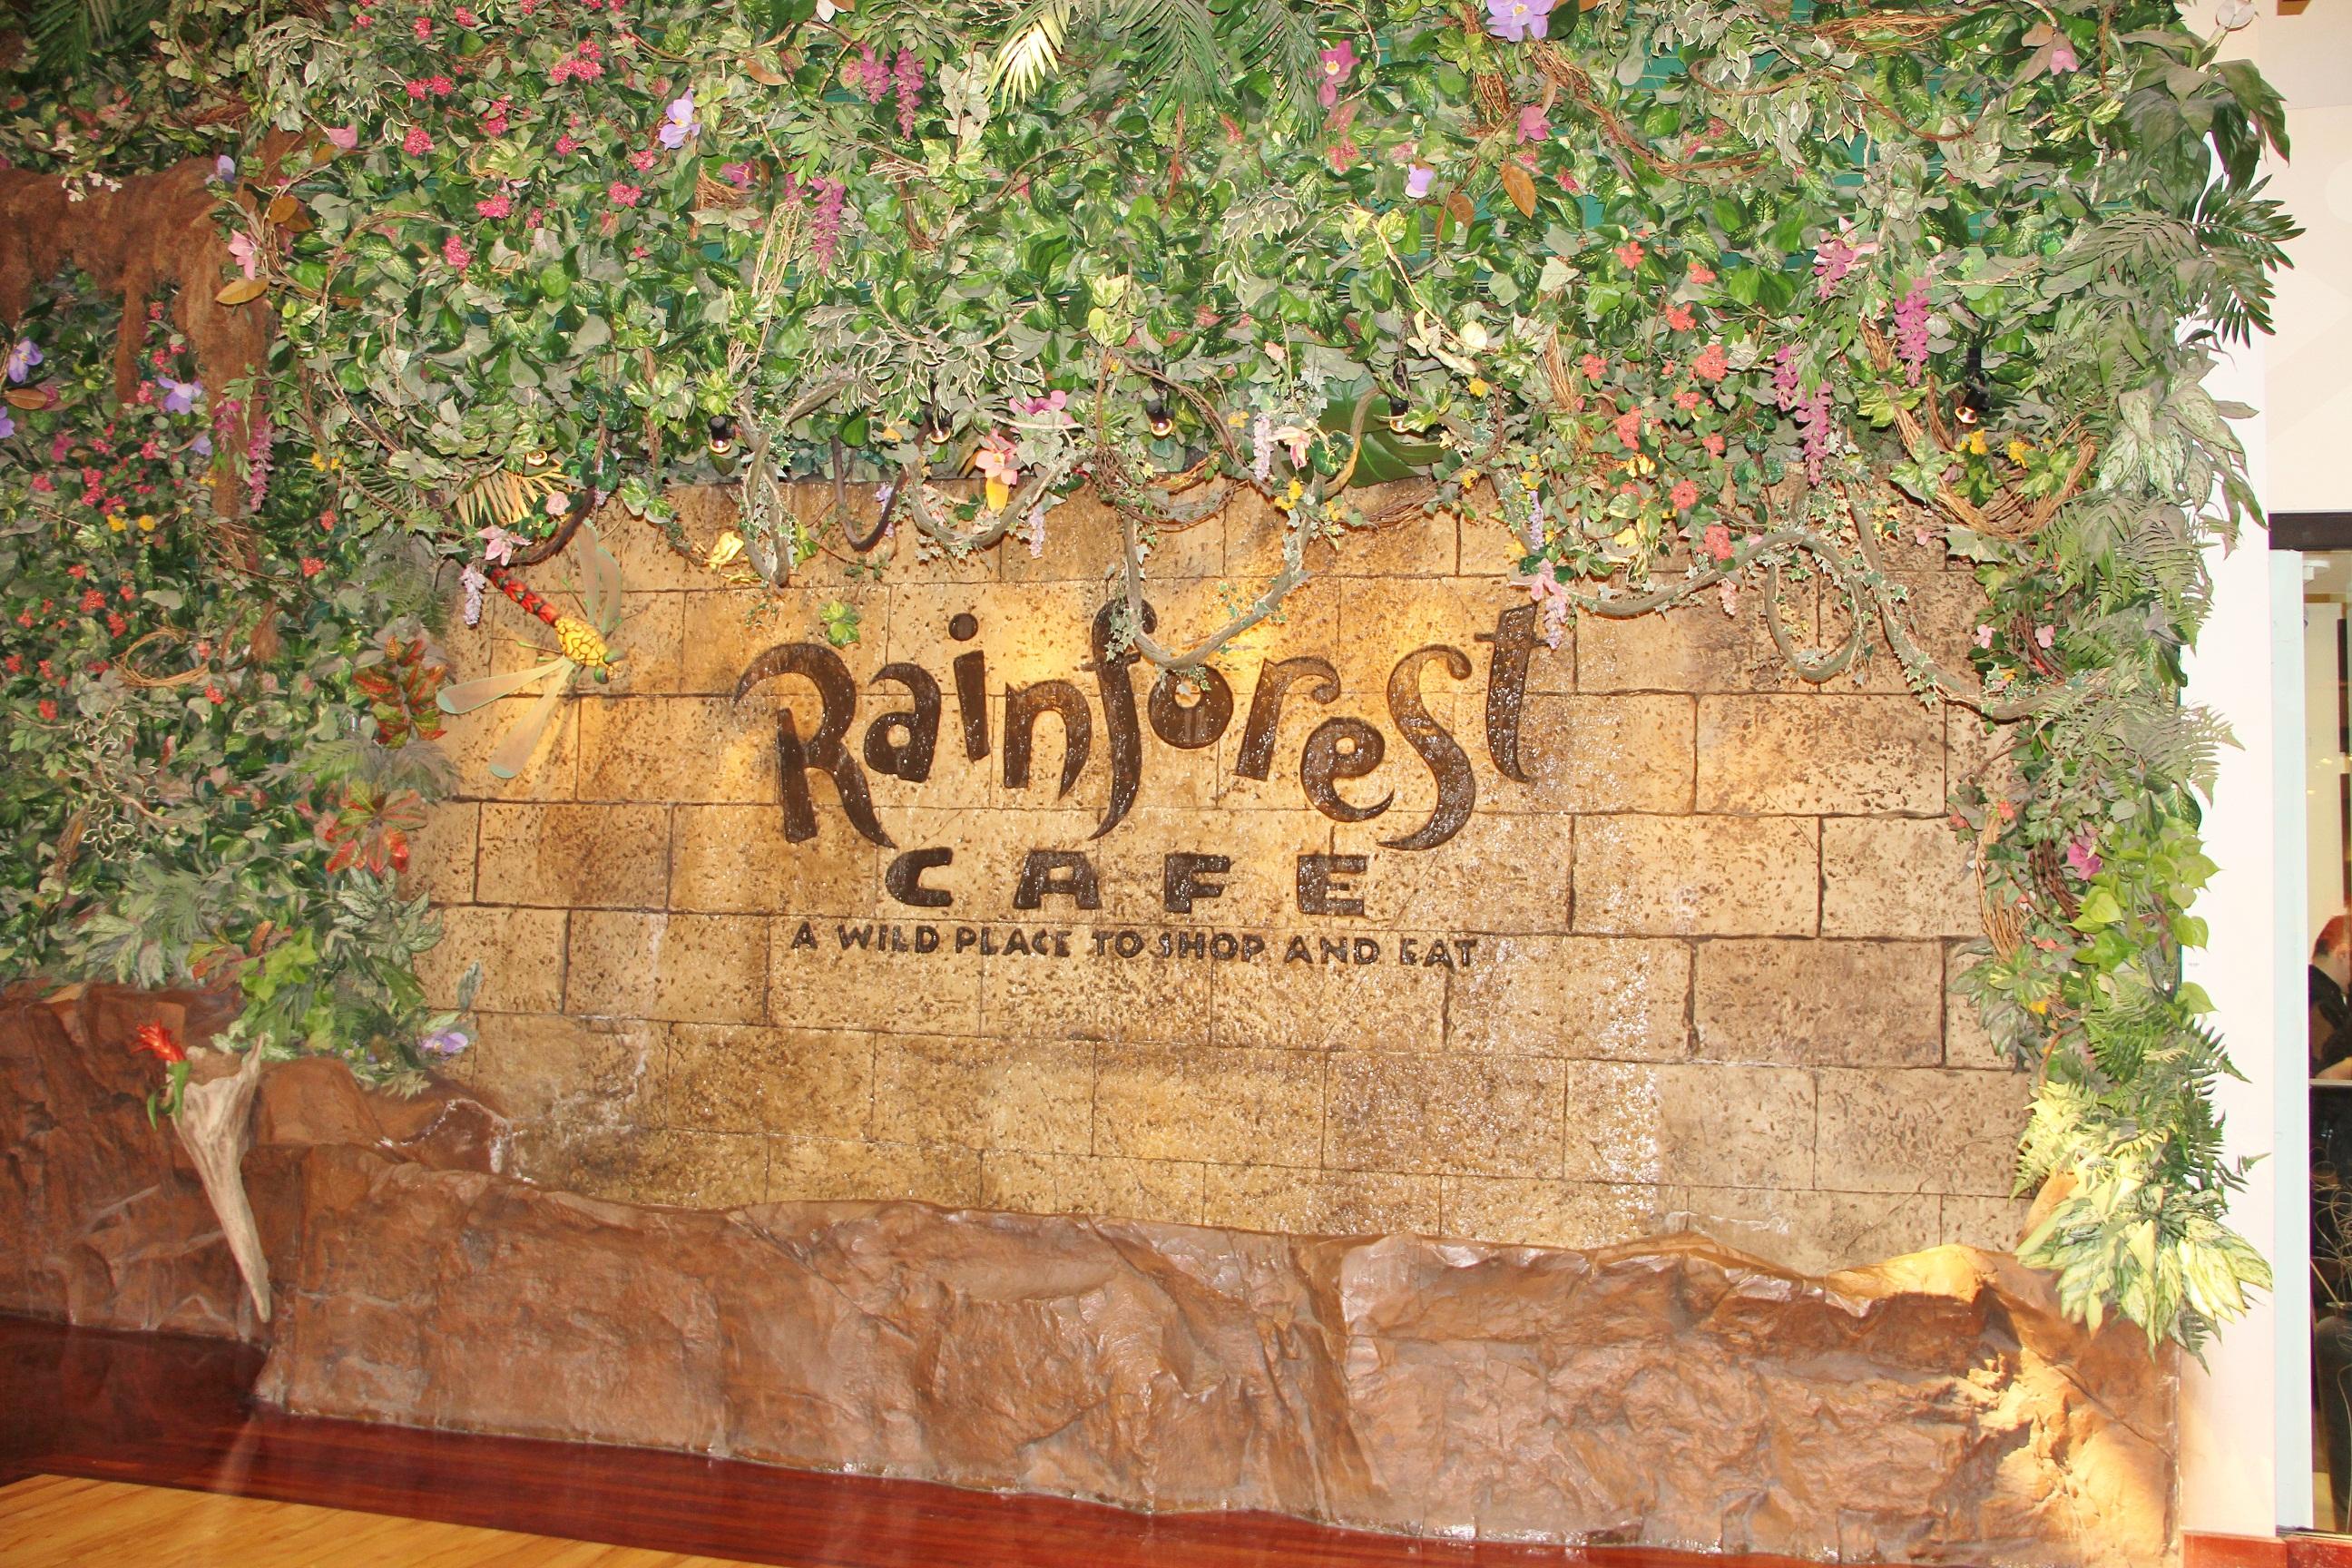 Permalink to Rainforest Cafe Menu